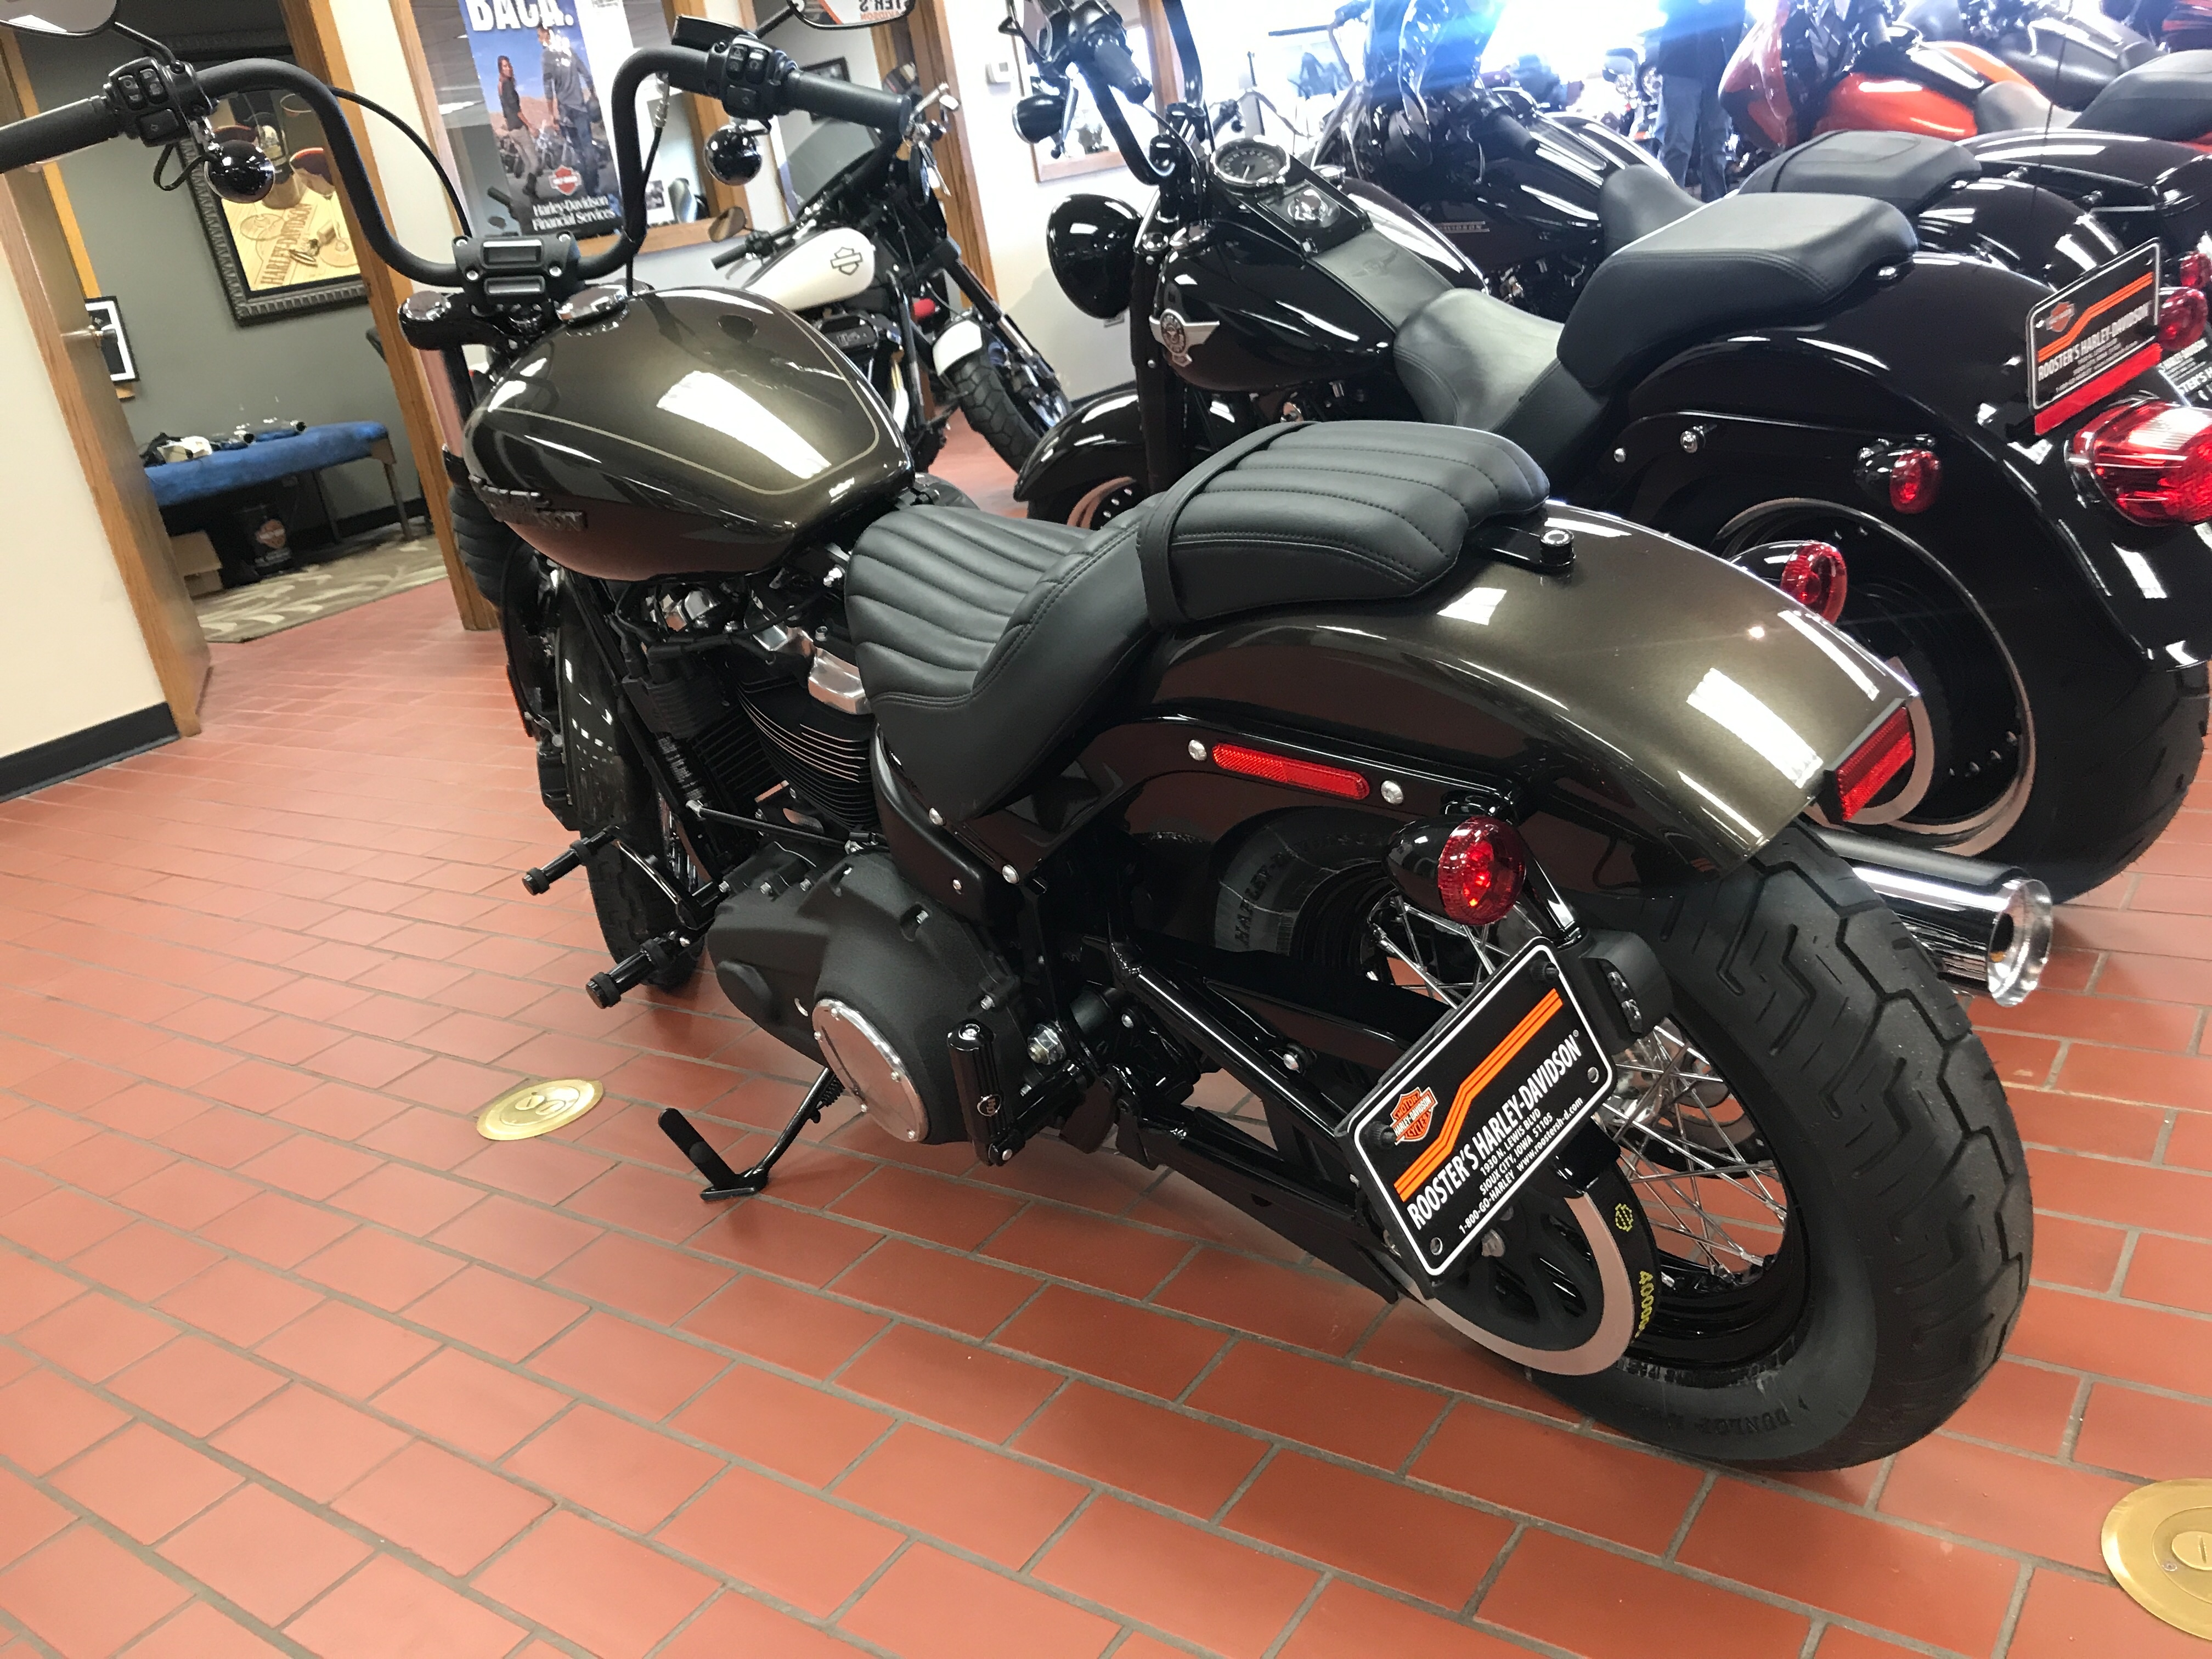 2020 Harley-Davidson Softail Street Bob at Rooster's Harley Davidson